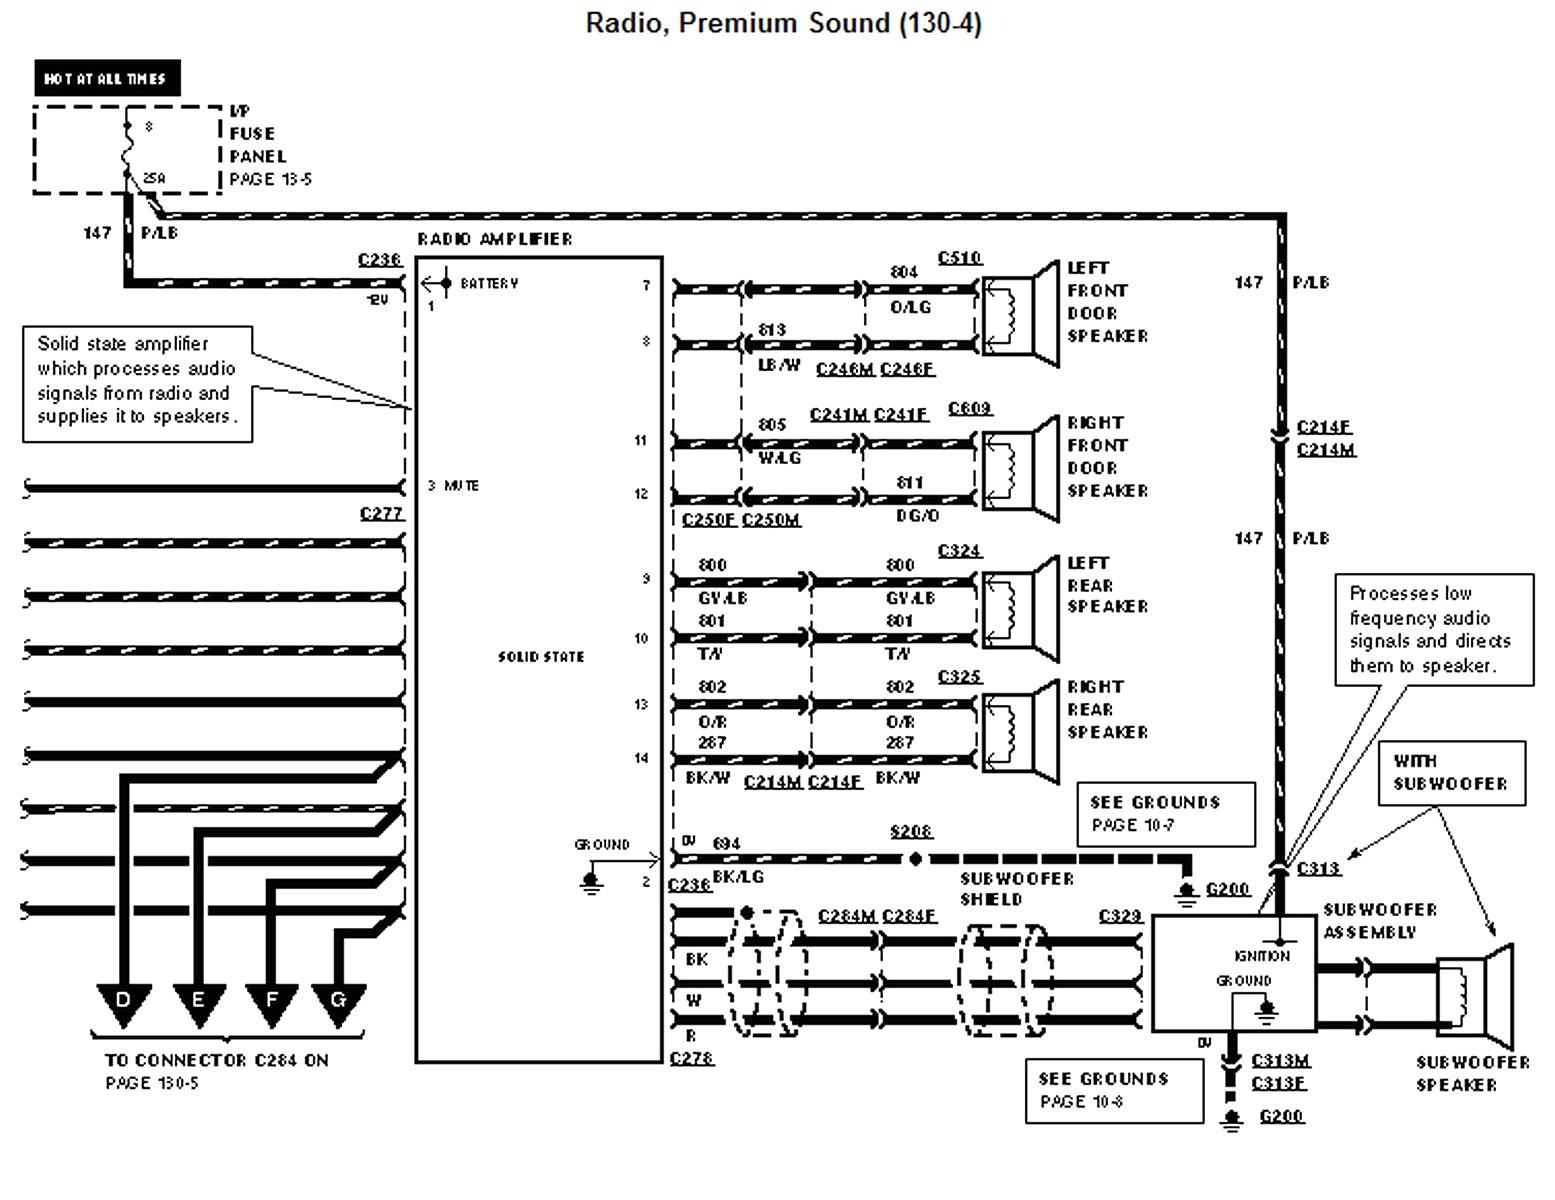 2000 ford f250 radio wiring wiring library rh evevo co 1999 F250 Starter Solenoid Wiring 2000 ford f250 radio wiring diagram